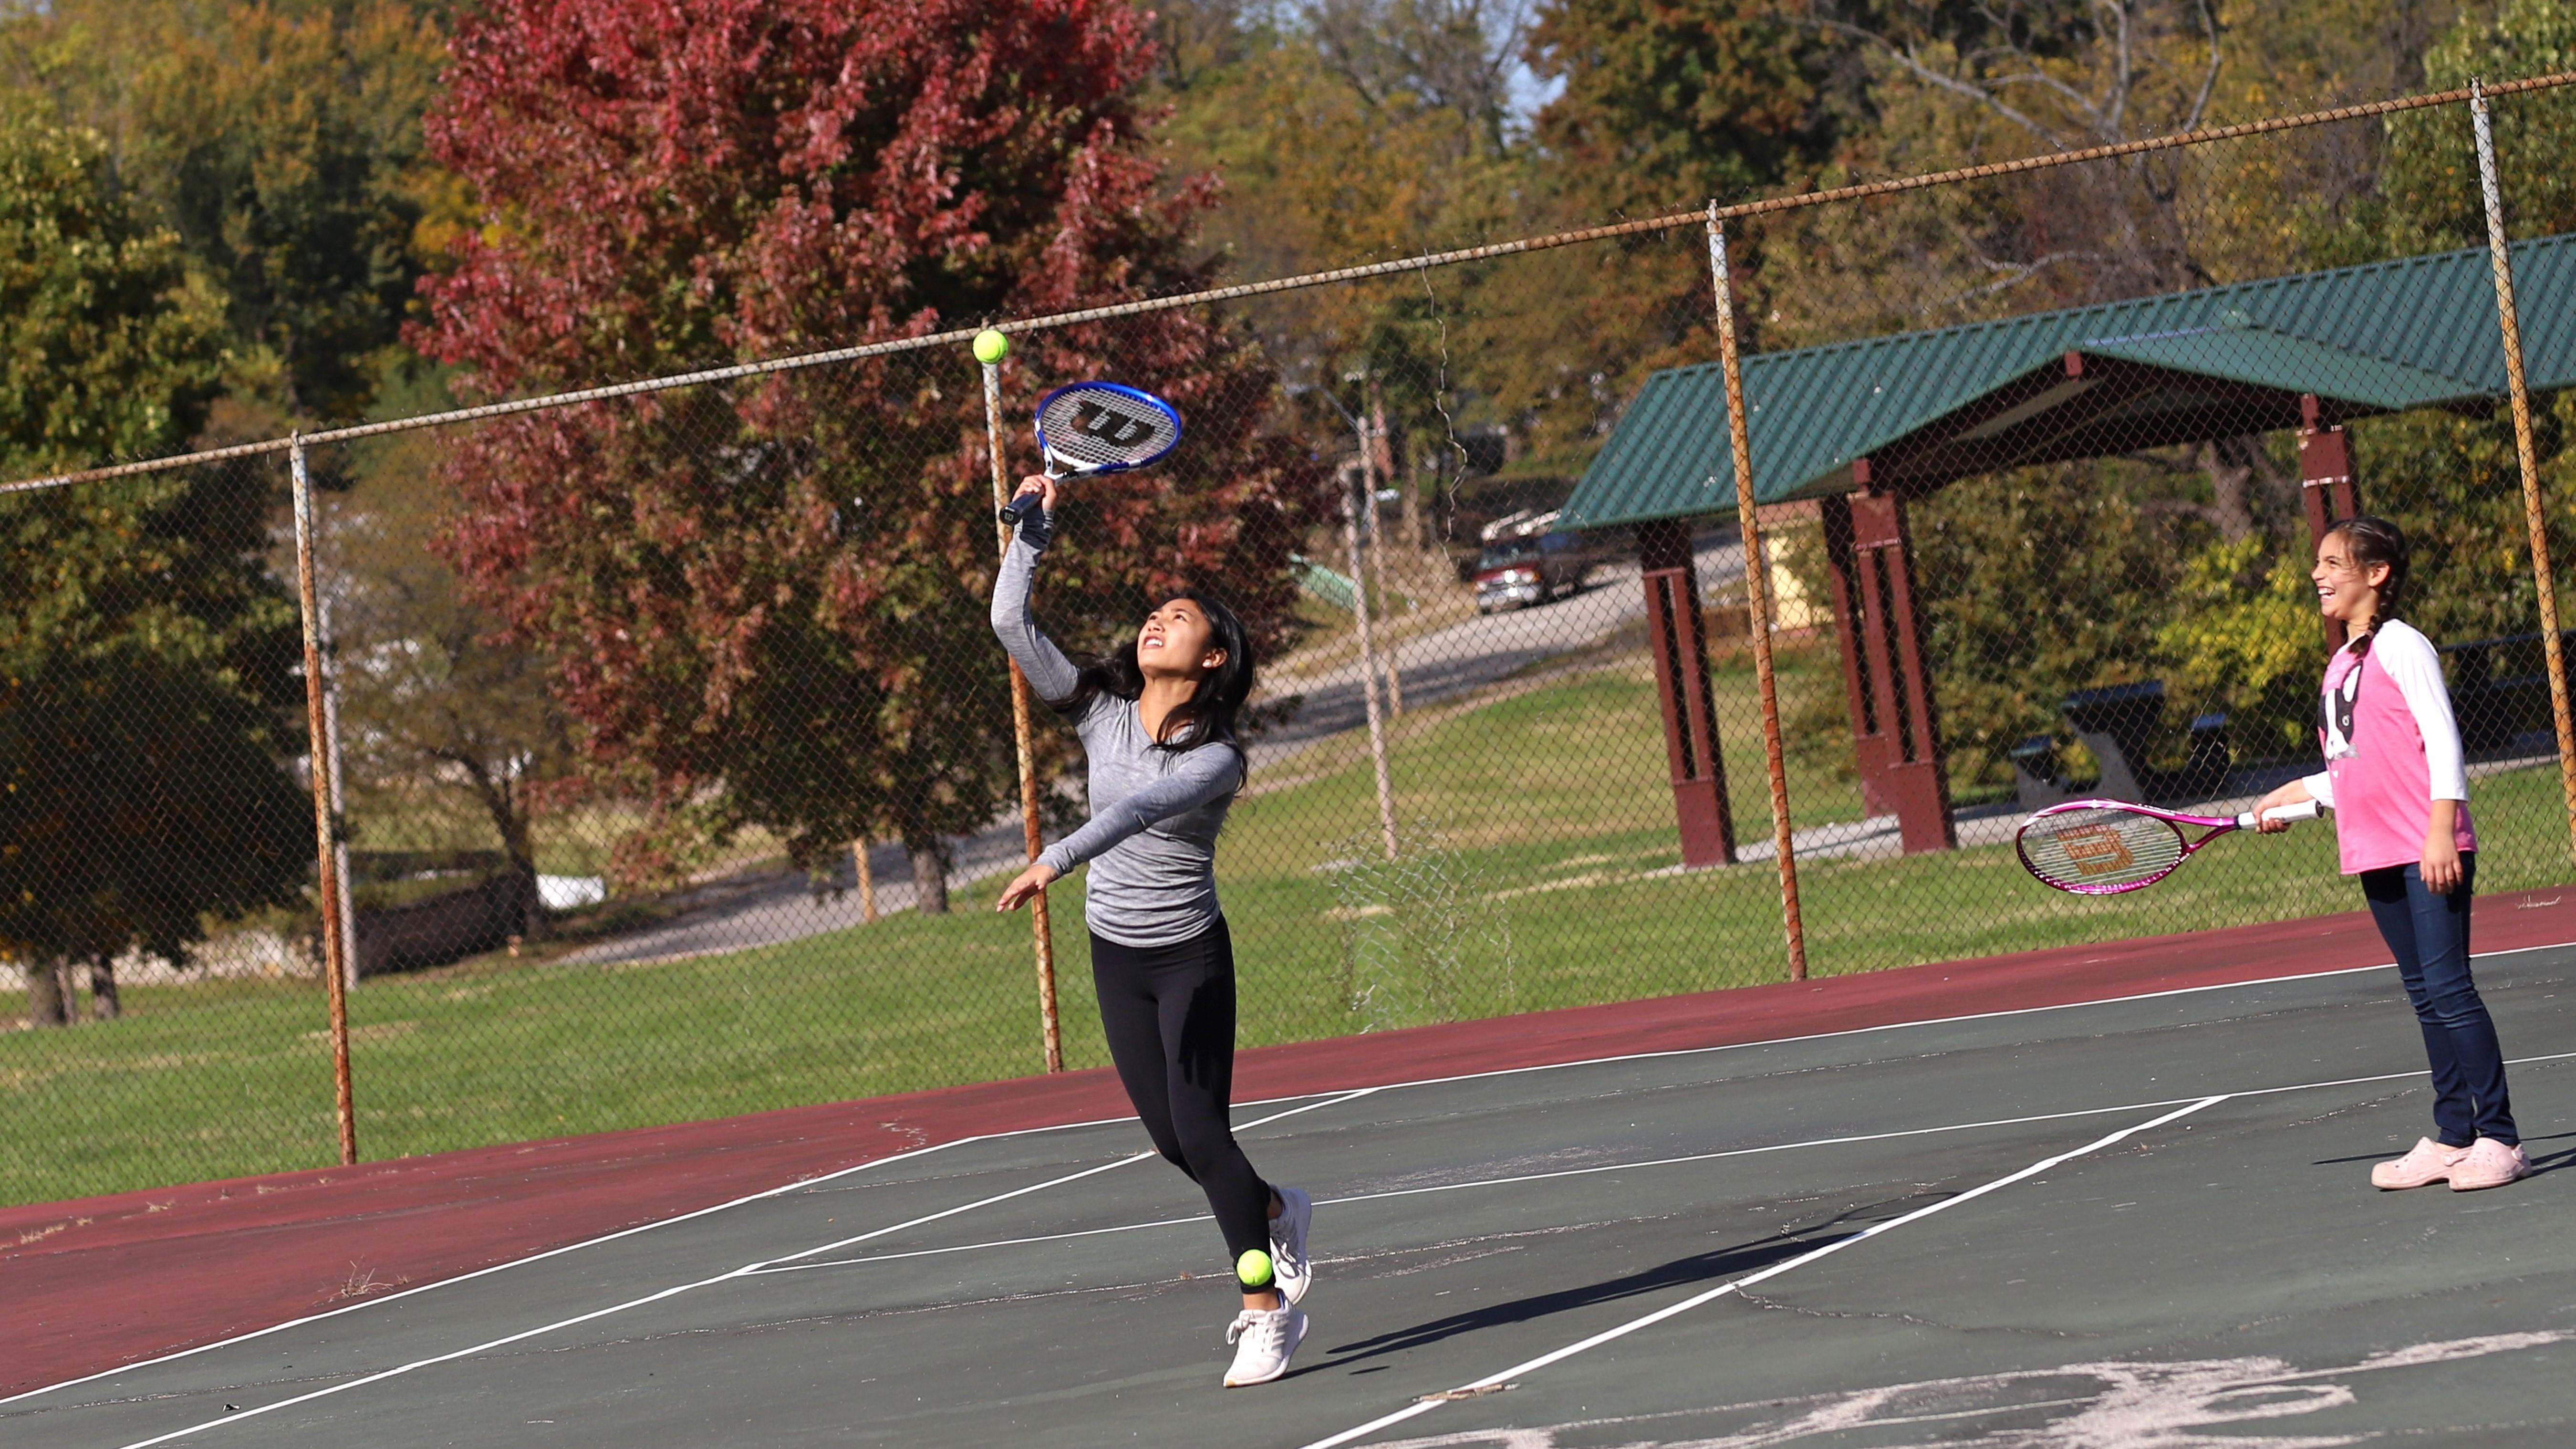 Ashland Square Park Tennis Courts